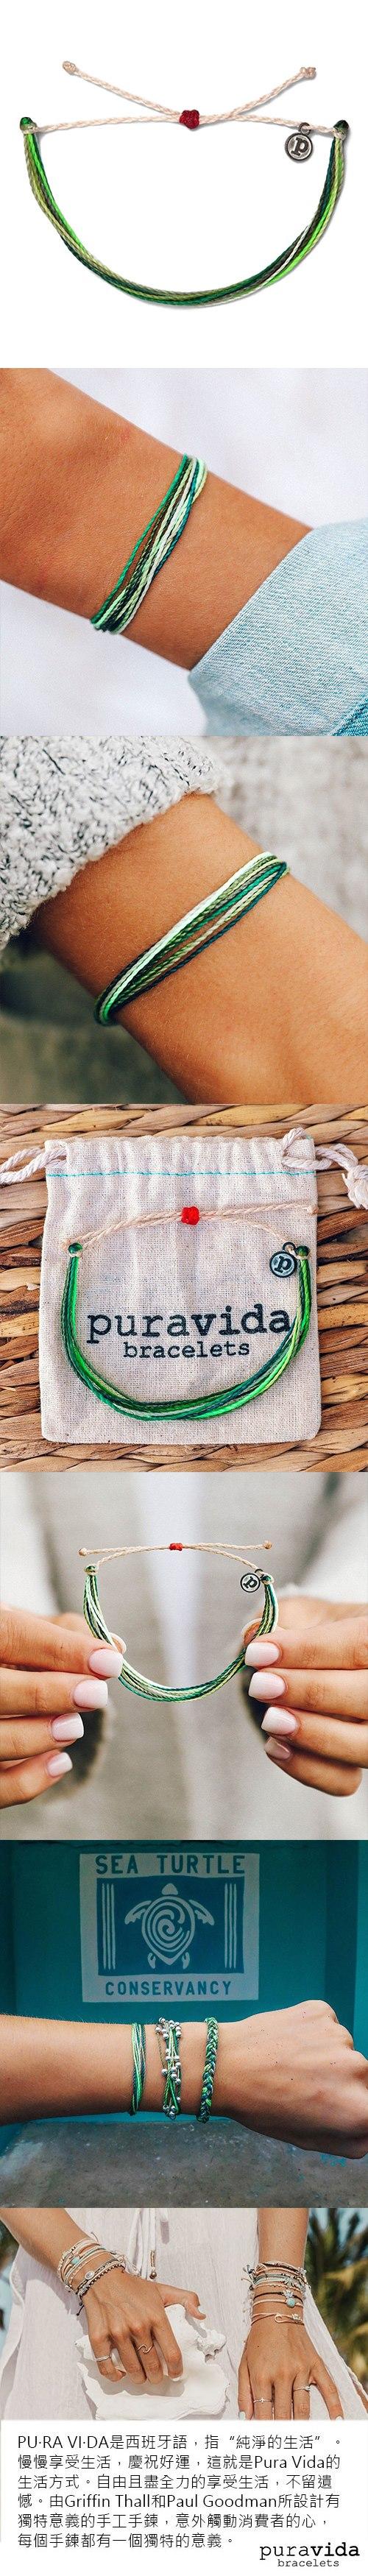 (複製)Pura Vida | 美國手工 For The Oceans蔚藍海洋 基本繽紛款可調式手鍊